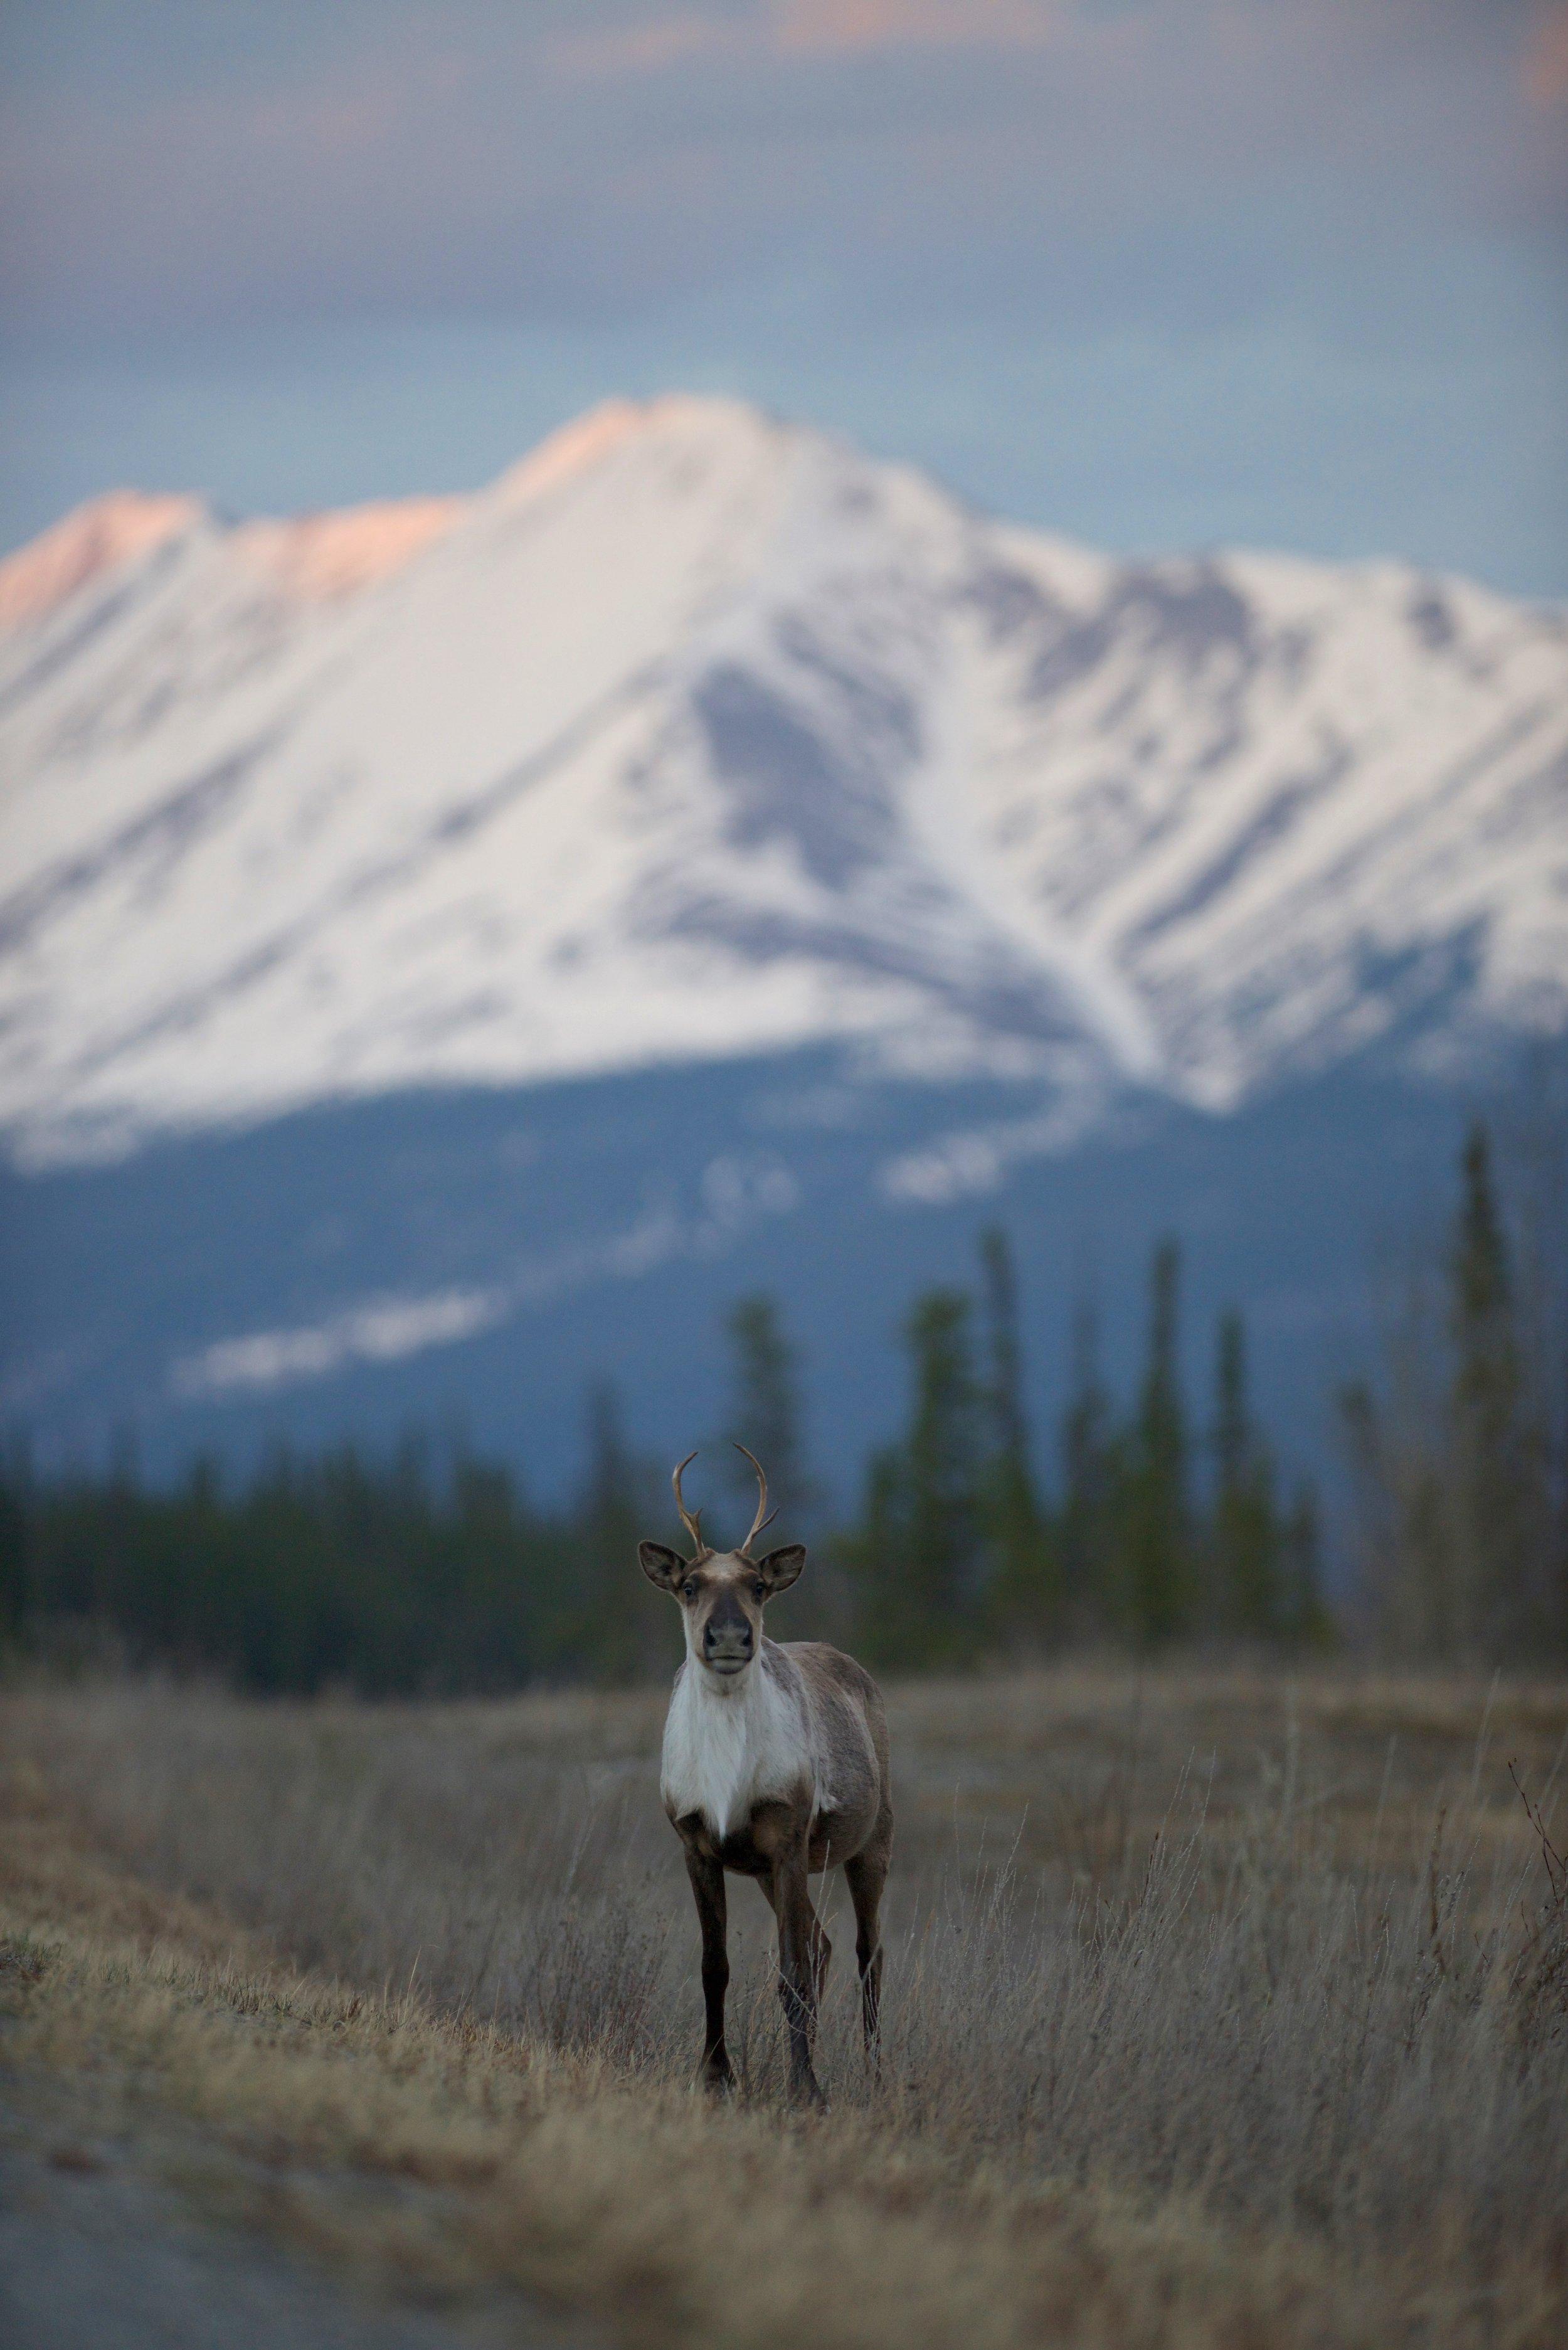 A caribou near Toad River, British Columbia